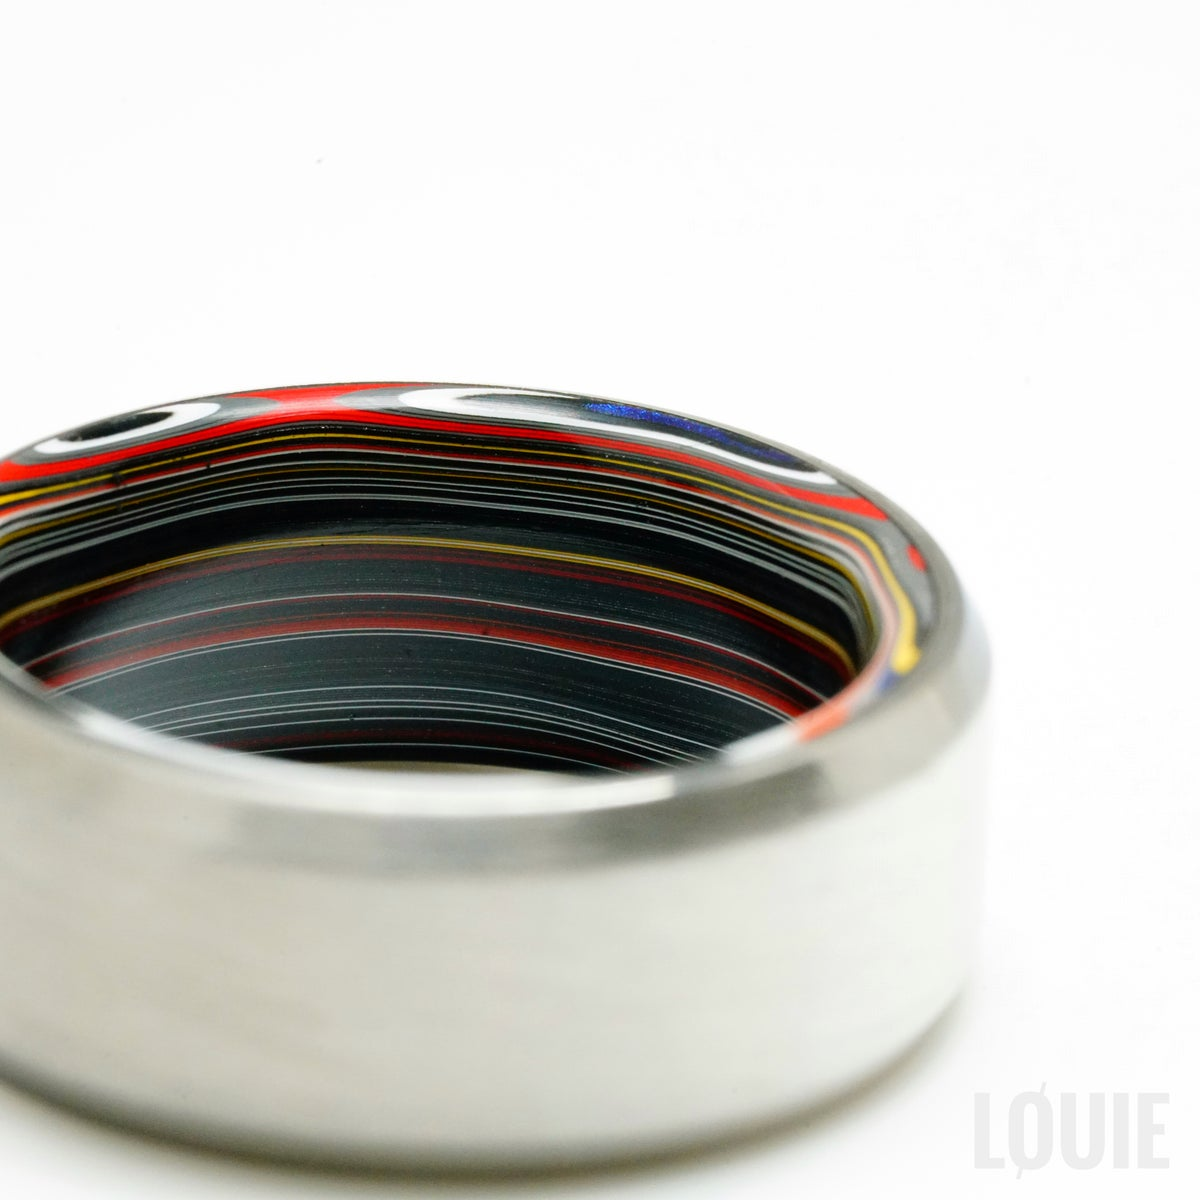 Image of Titanium (or carbon) Fordite roller (Limited)